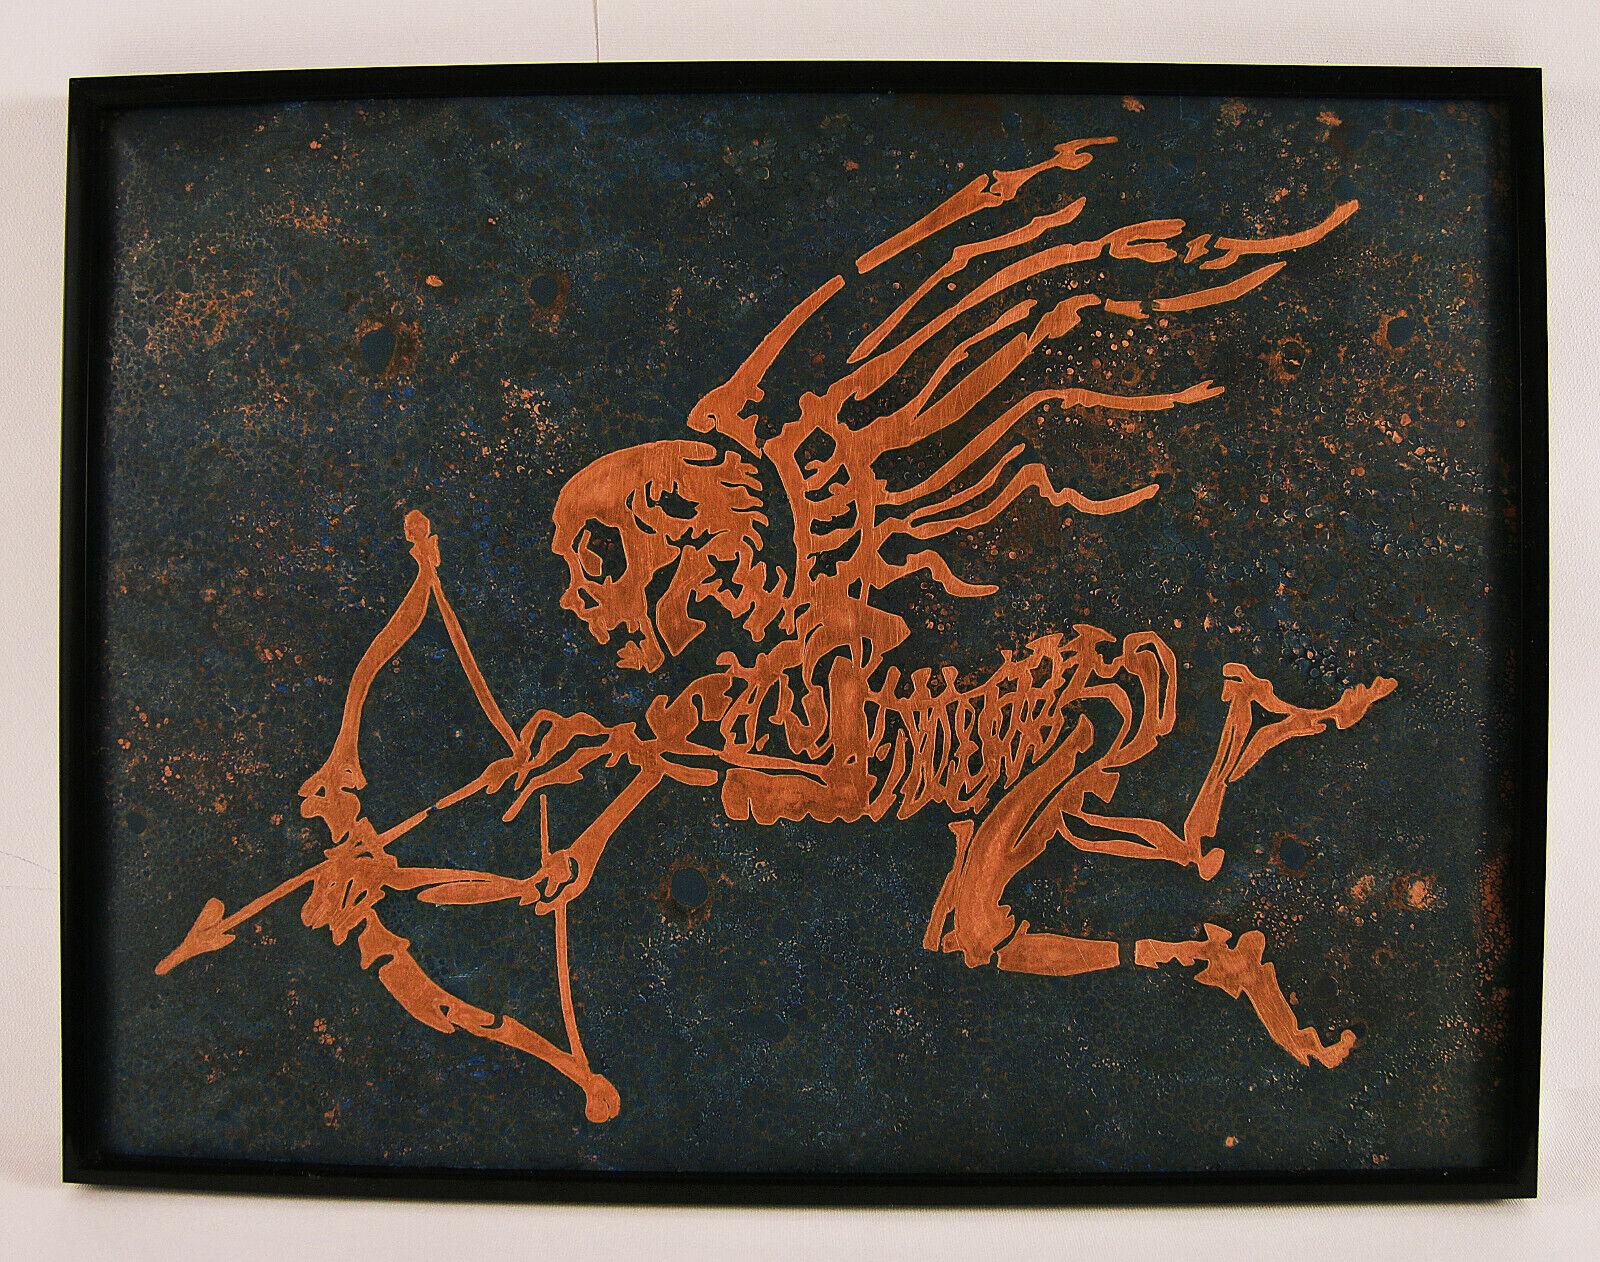 Skeleton Cupid Eros Gift Metal Wand Kunst Drucken Poster Kunstwork Home Decor